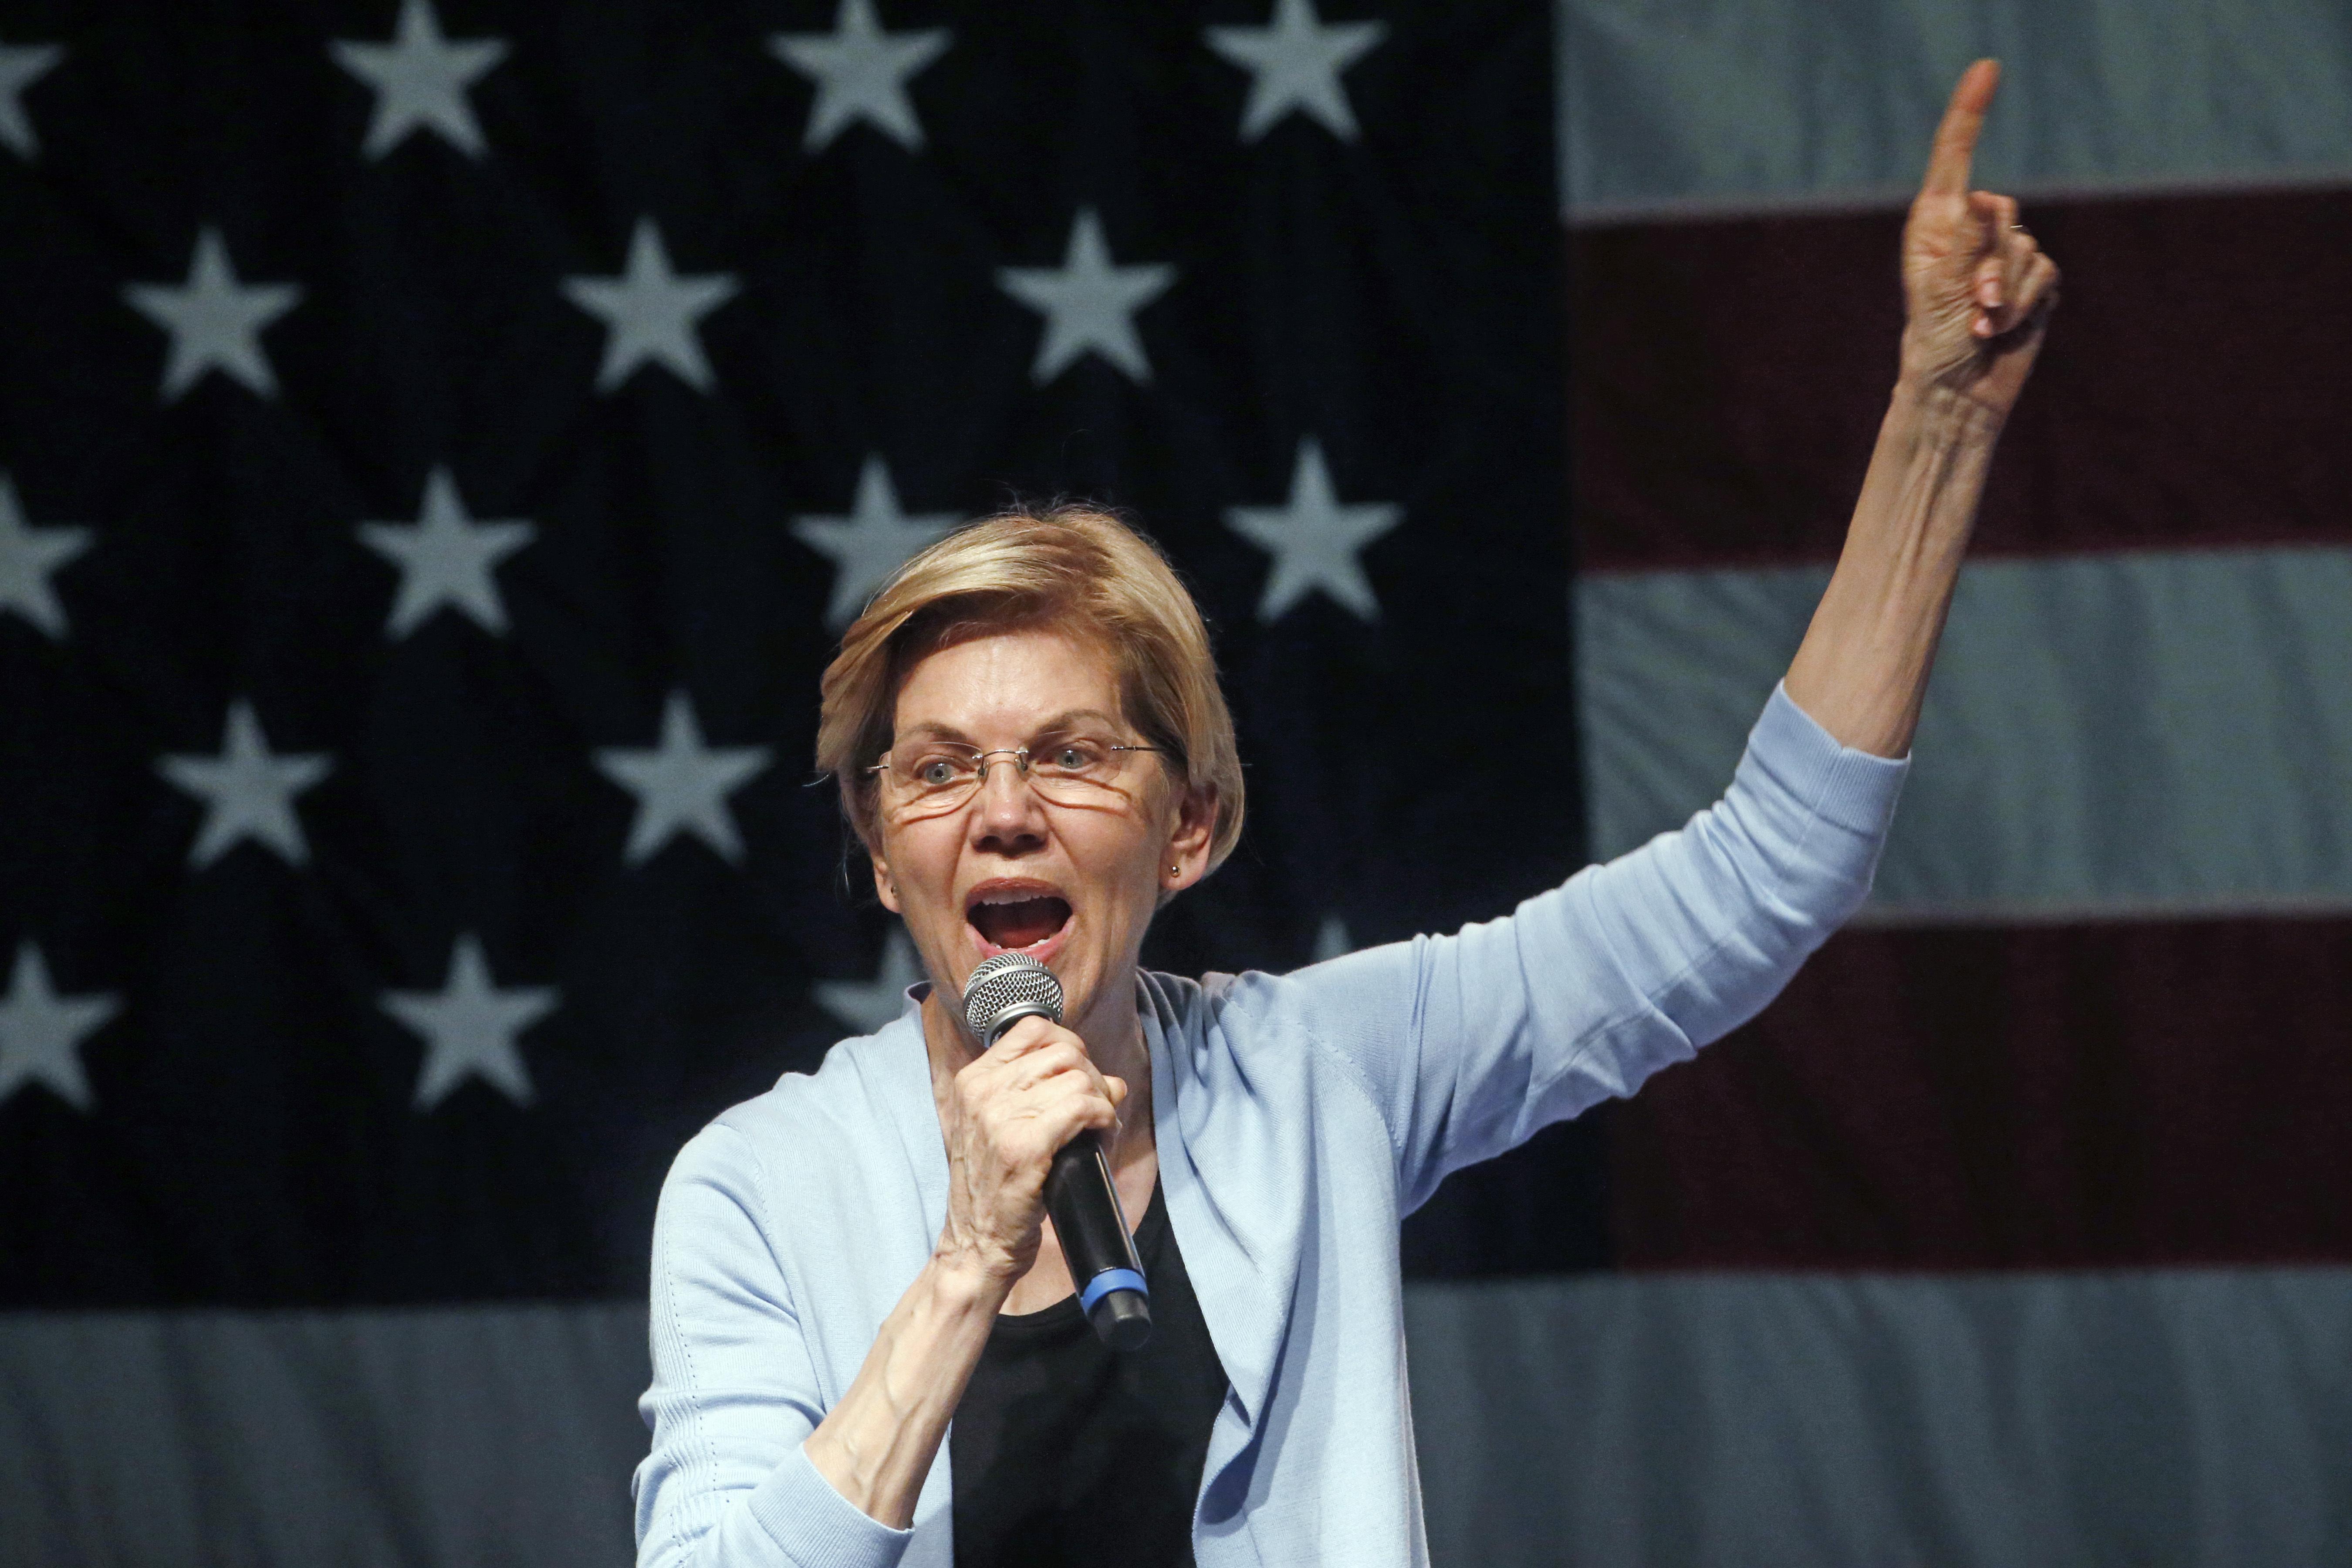 Elizabeth Warren unveils plan to erase $50,000 of student debt for most Americans